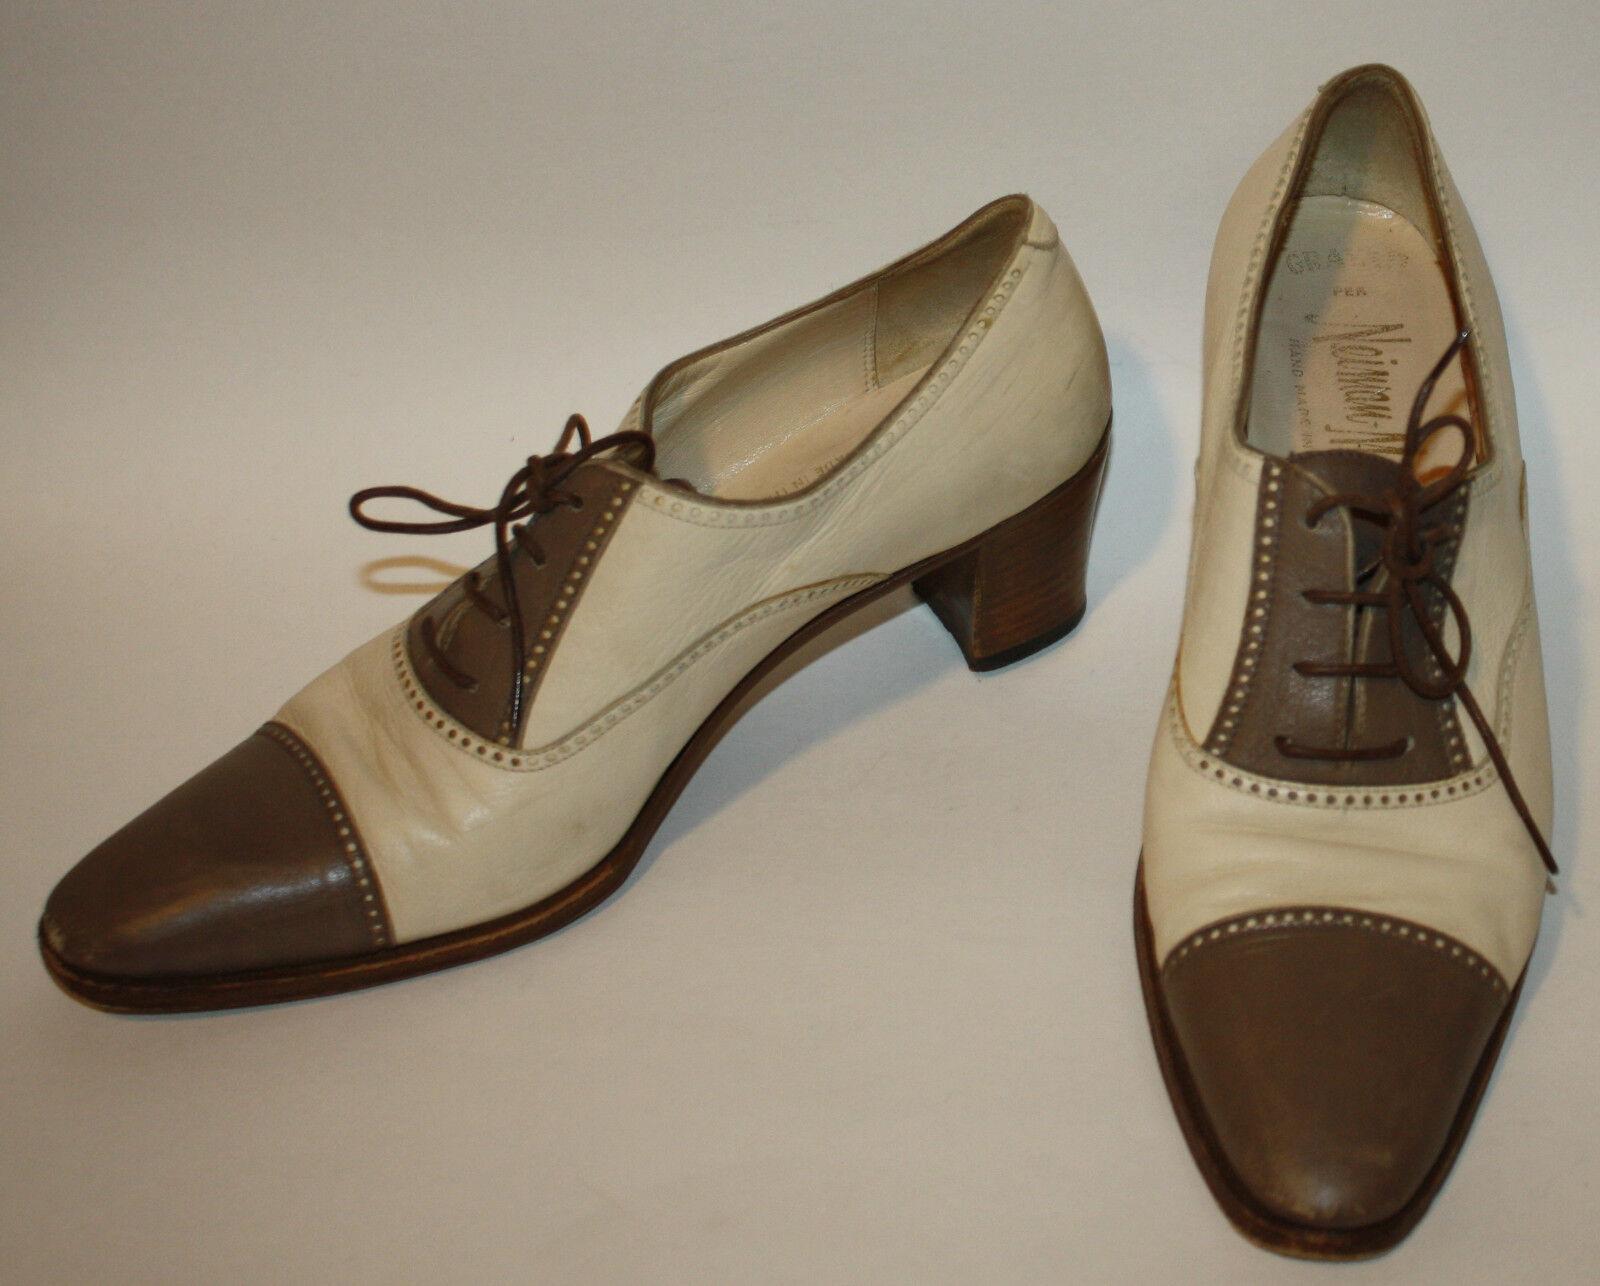 GRAVATI Spectator Neiman Marcus Taupe Ivory Leather Spectator GRAVATI Brogue Oxford Shoes 9N fce0ac